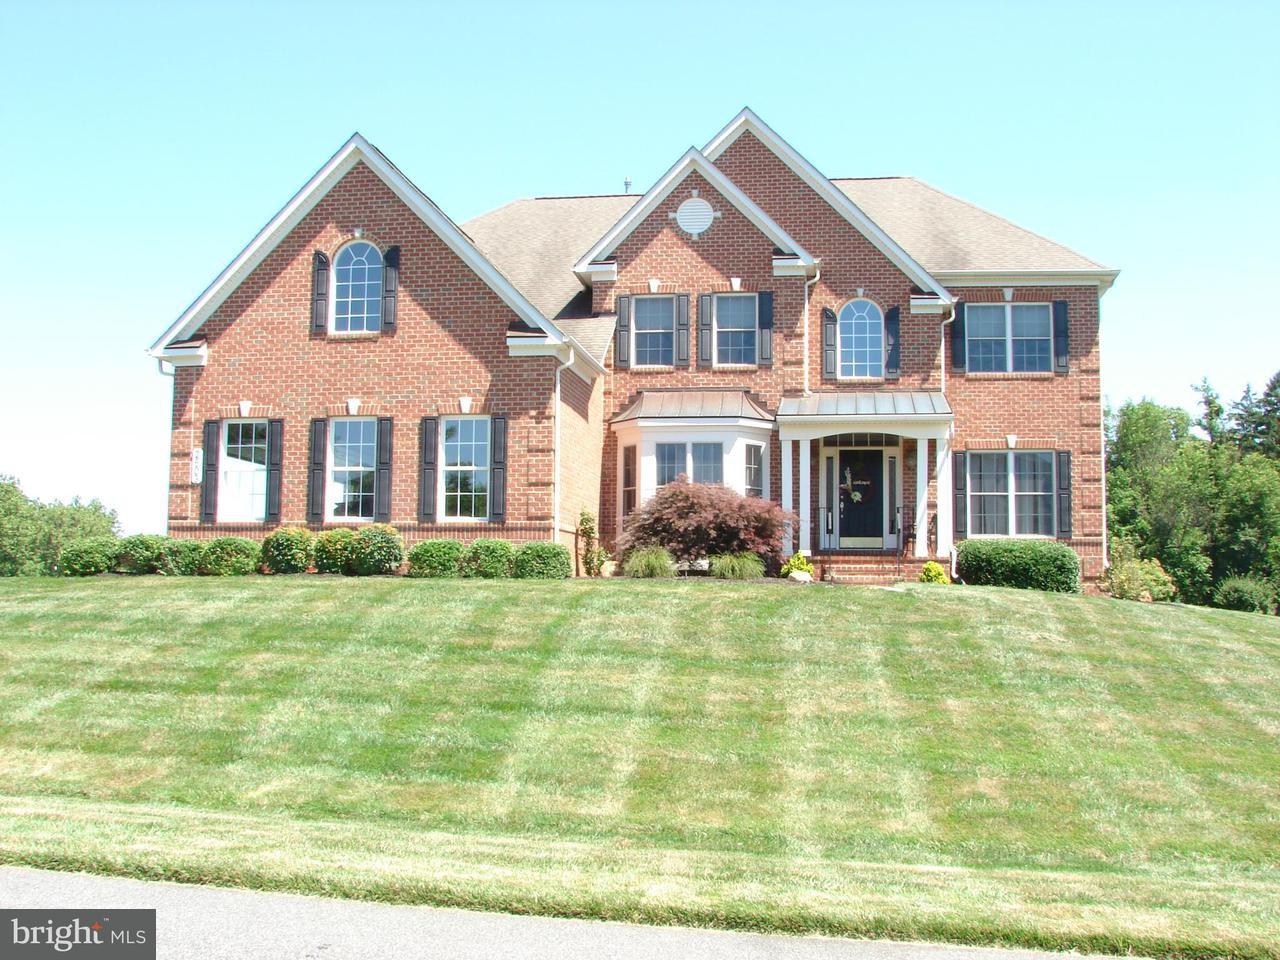 Moradia para Venda às 2603 Laurel View Court 2603 Laurel View Court Fallston, Maryland 21047 Estados Unidos